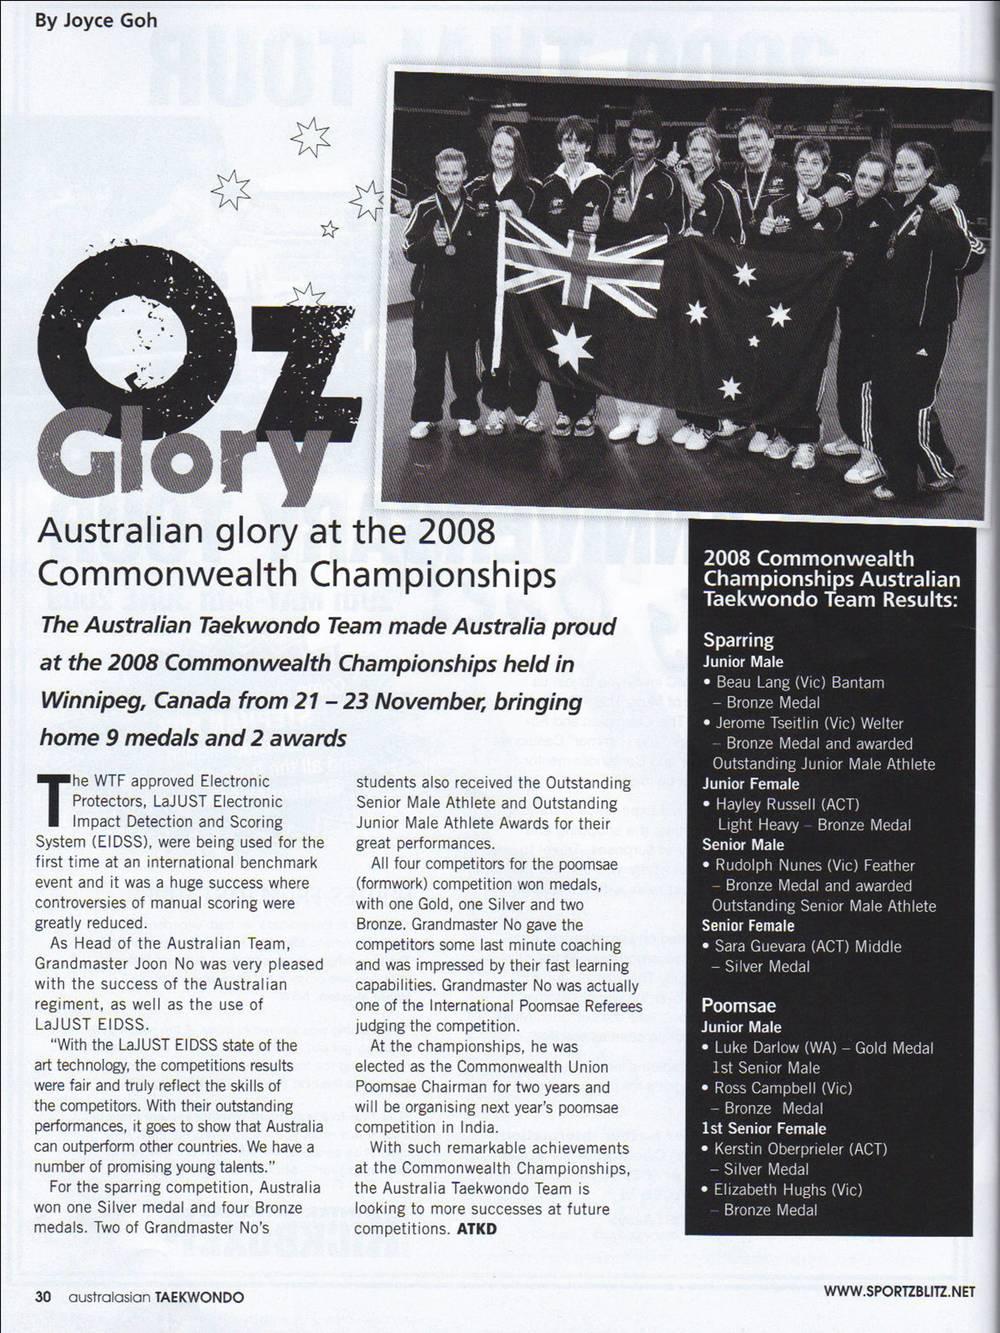 ozglory2008.jpg